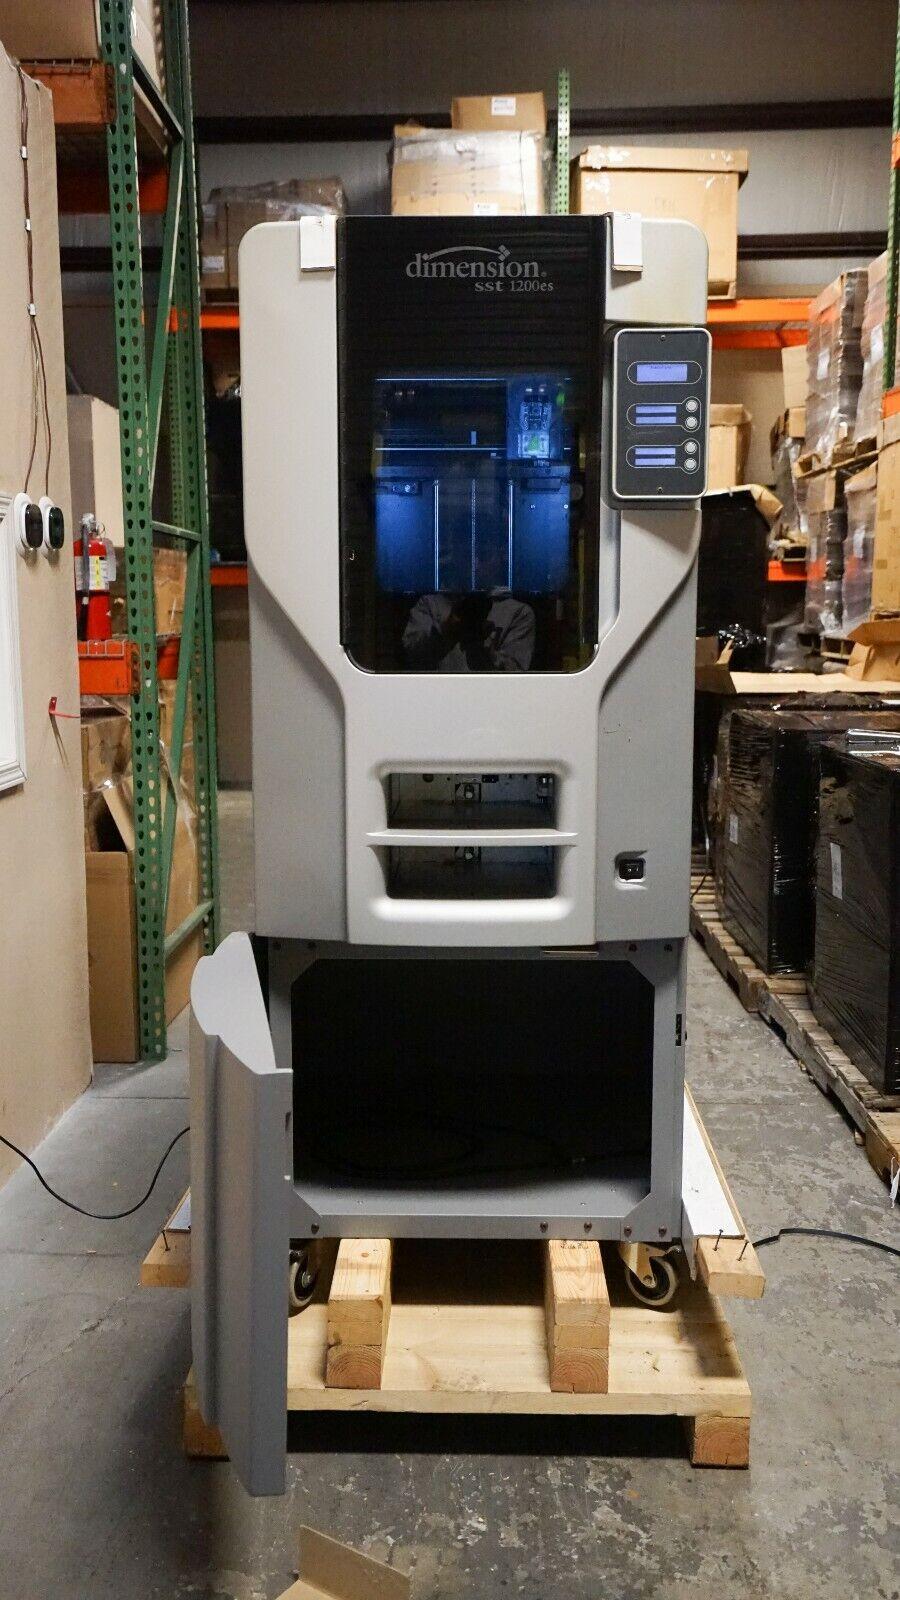 STRATASYS DIMENSION - SST 1200es 3D Printer 180-00102